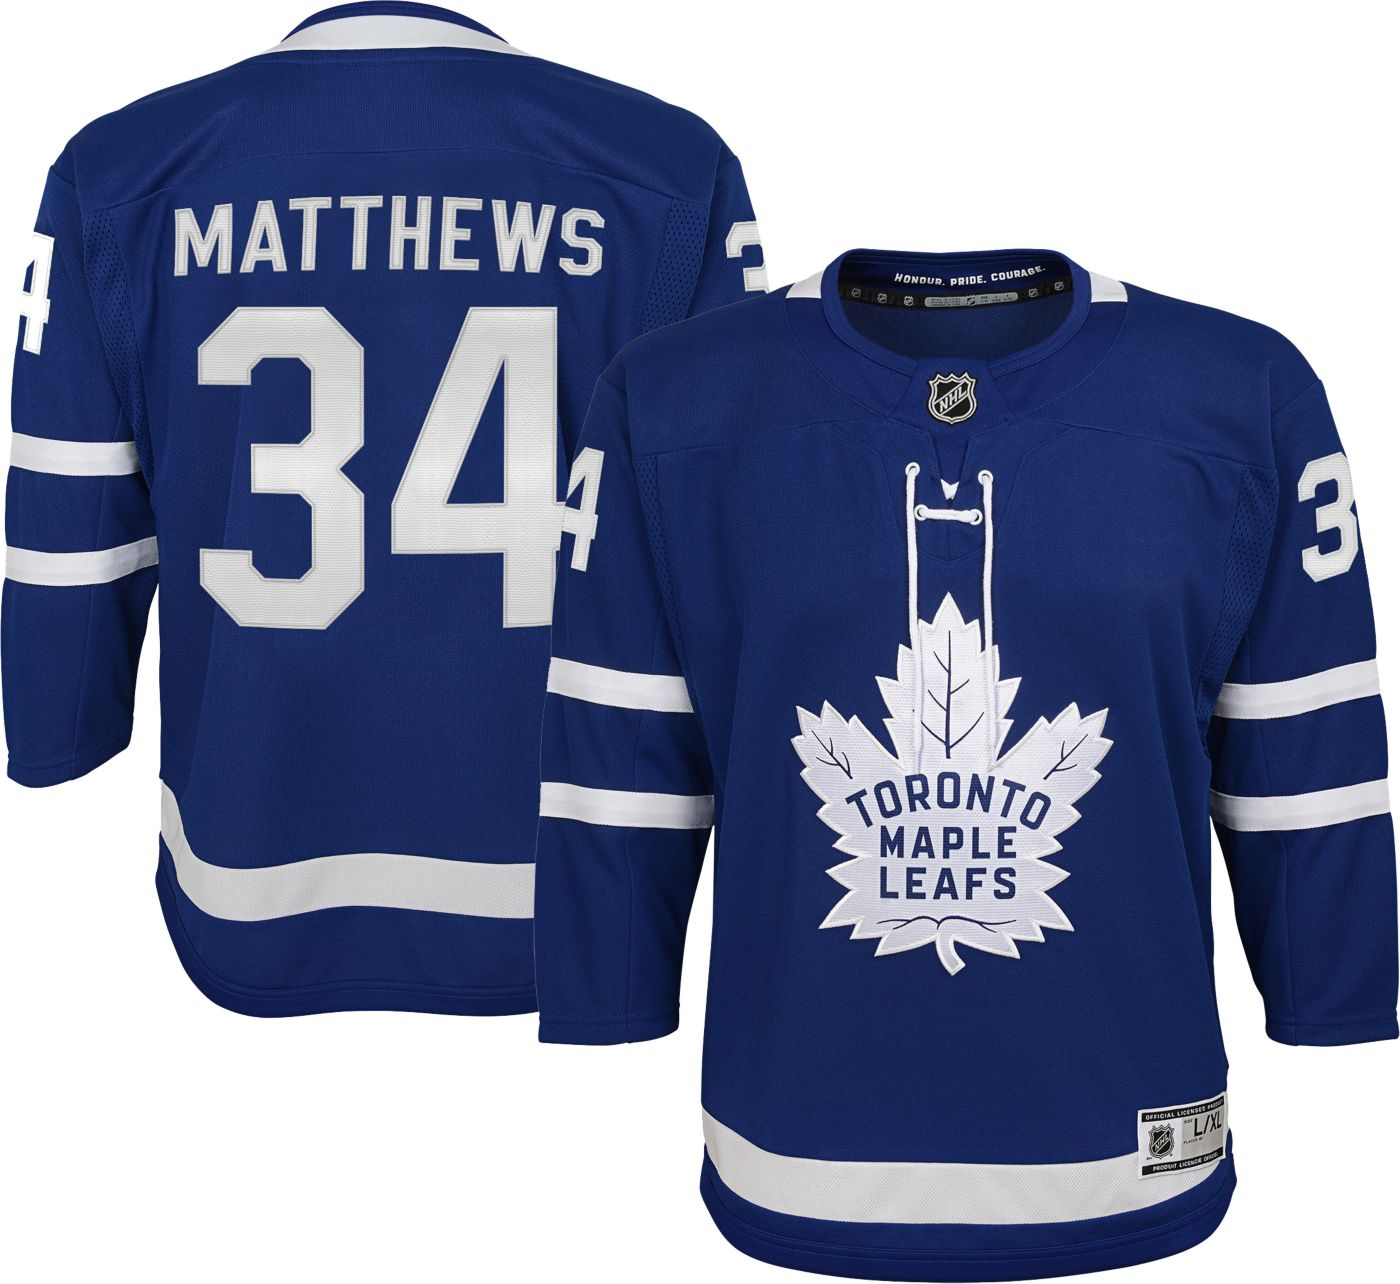 NHL Youth Toronto Maple Leafs Auston Matthews #34 Premier Home Jersey